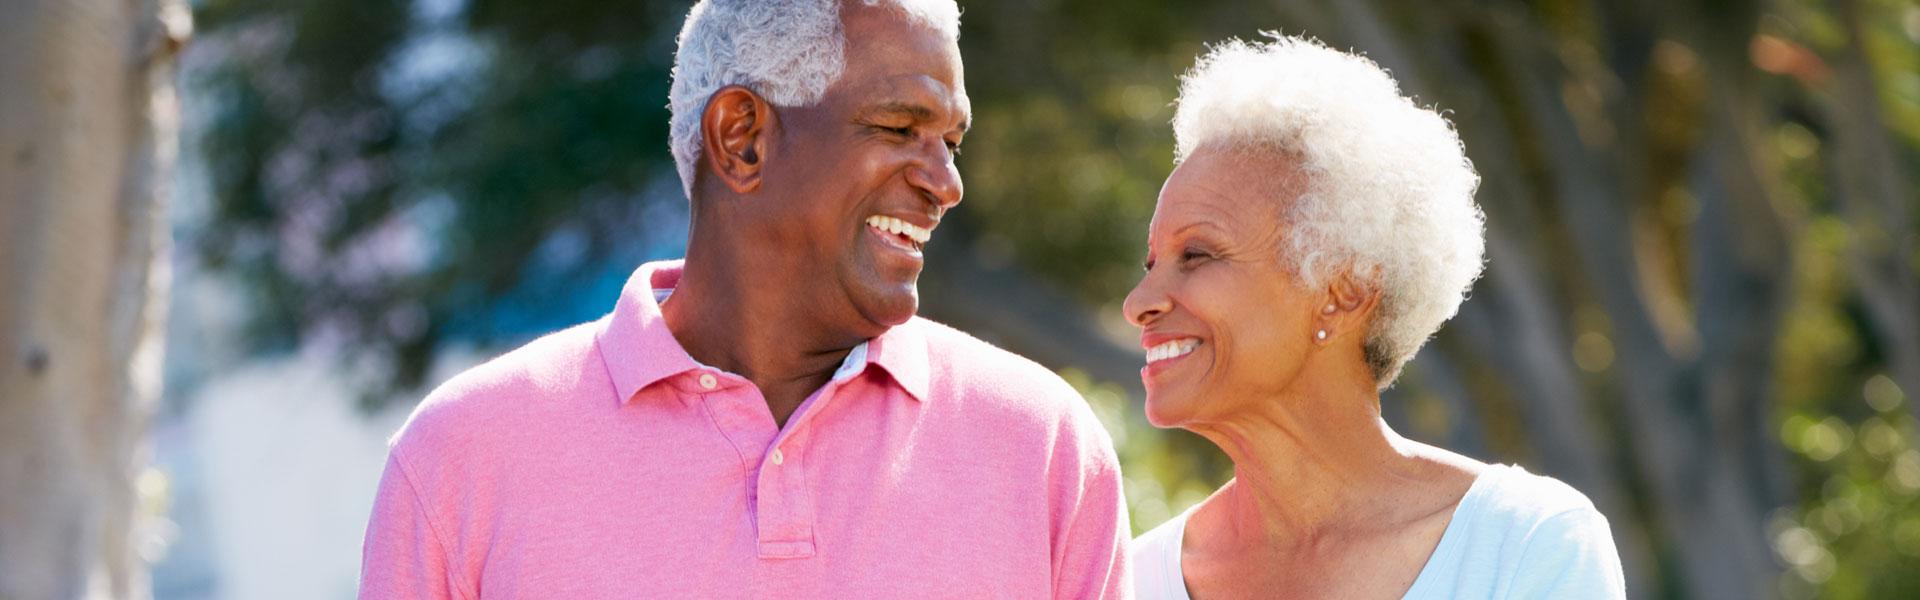 An elderly couple walking outdoors